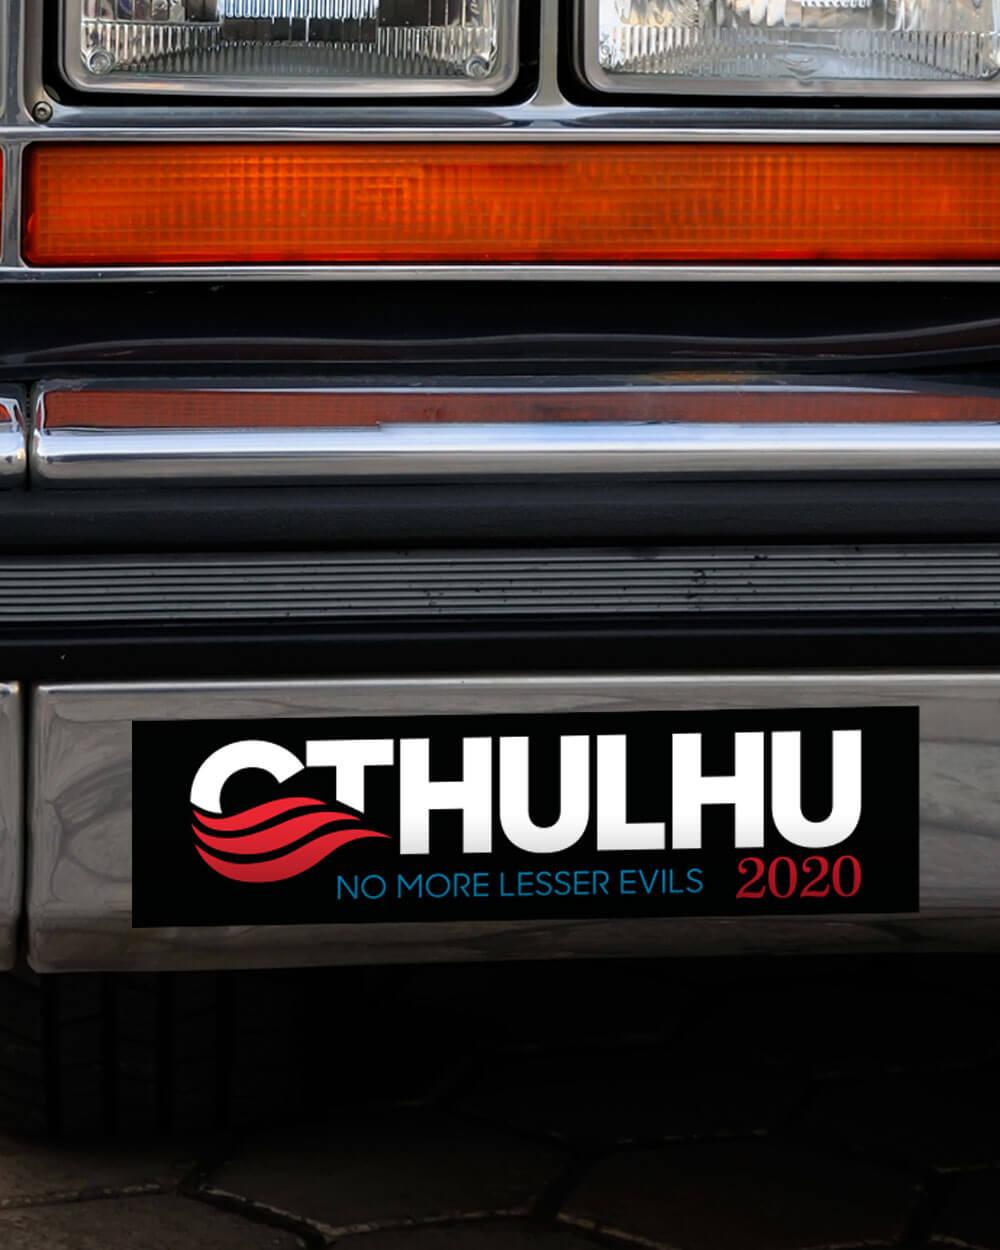 Cthulhu for president 2020 bumper sticker